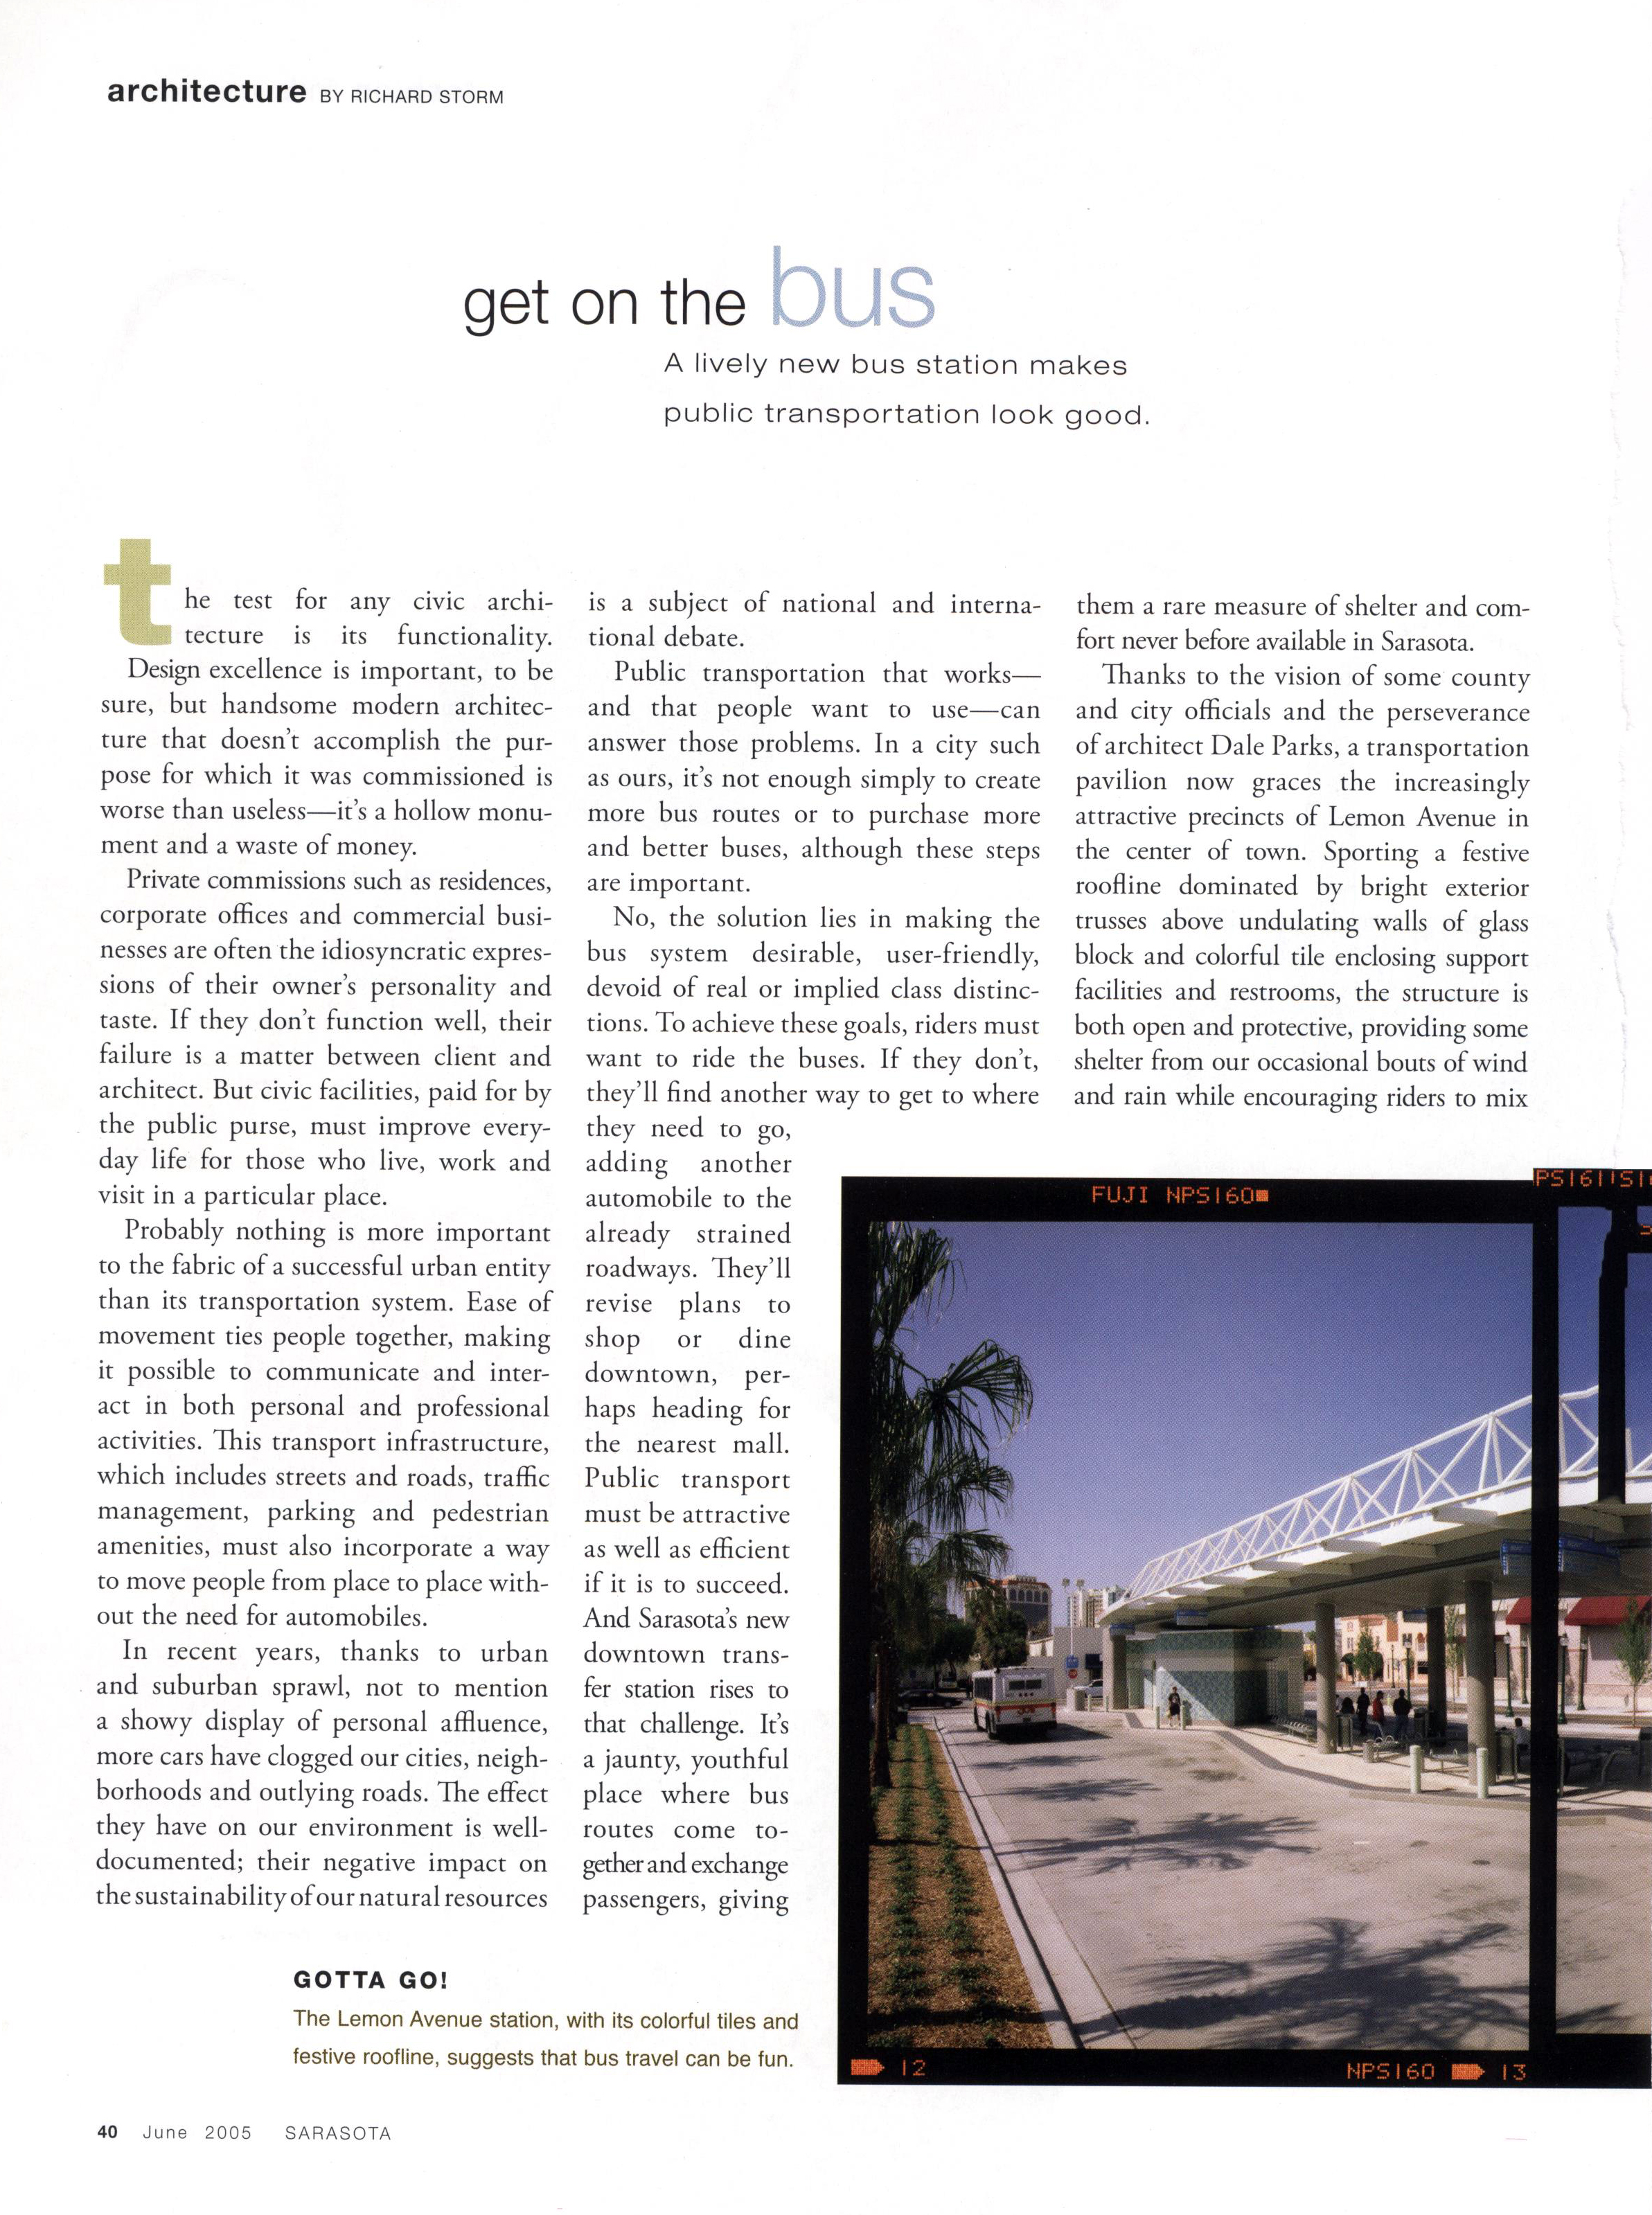 Sarasota 2005 (Publications) 002 SC-6.jpg